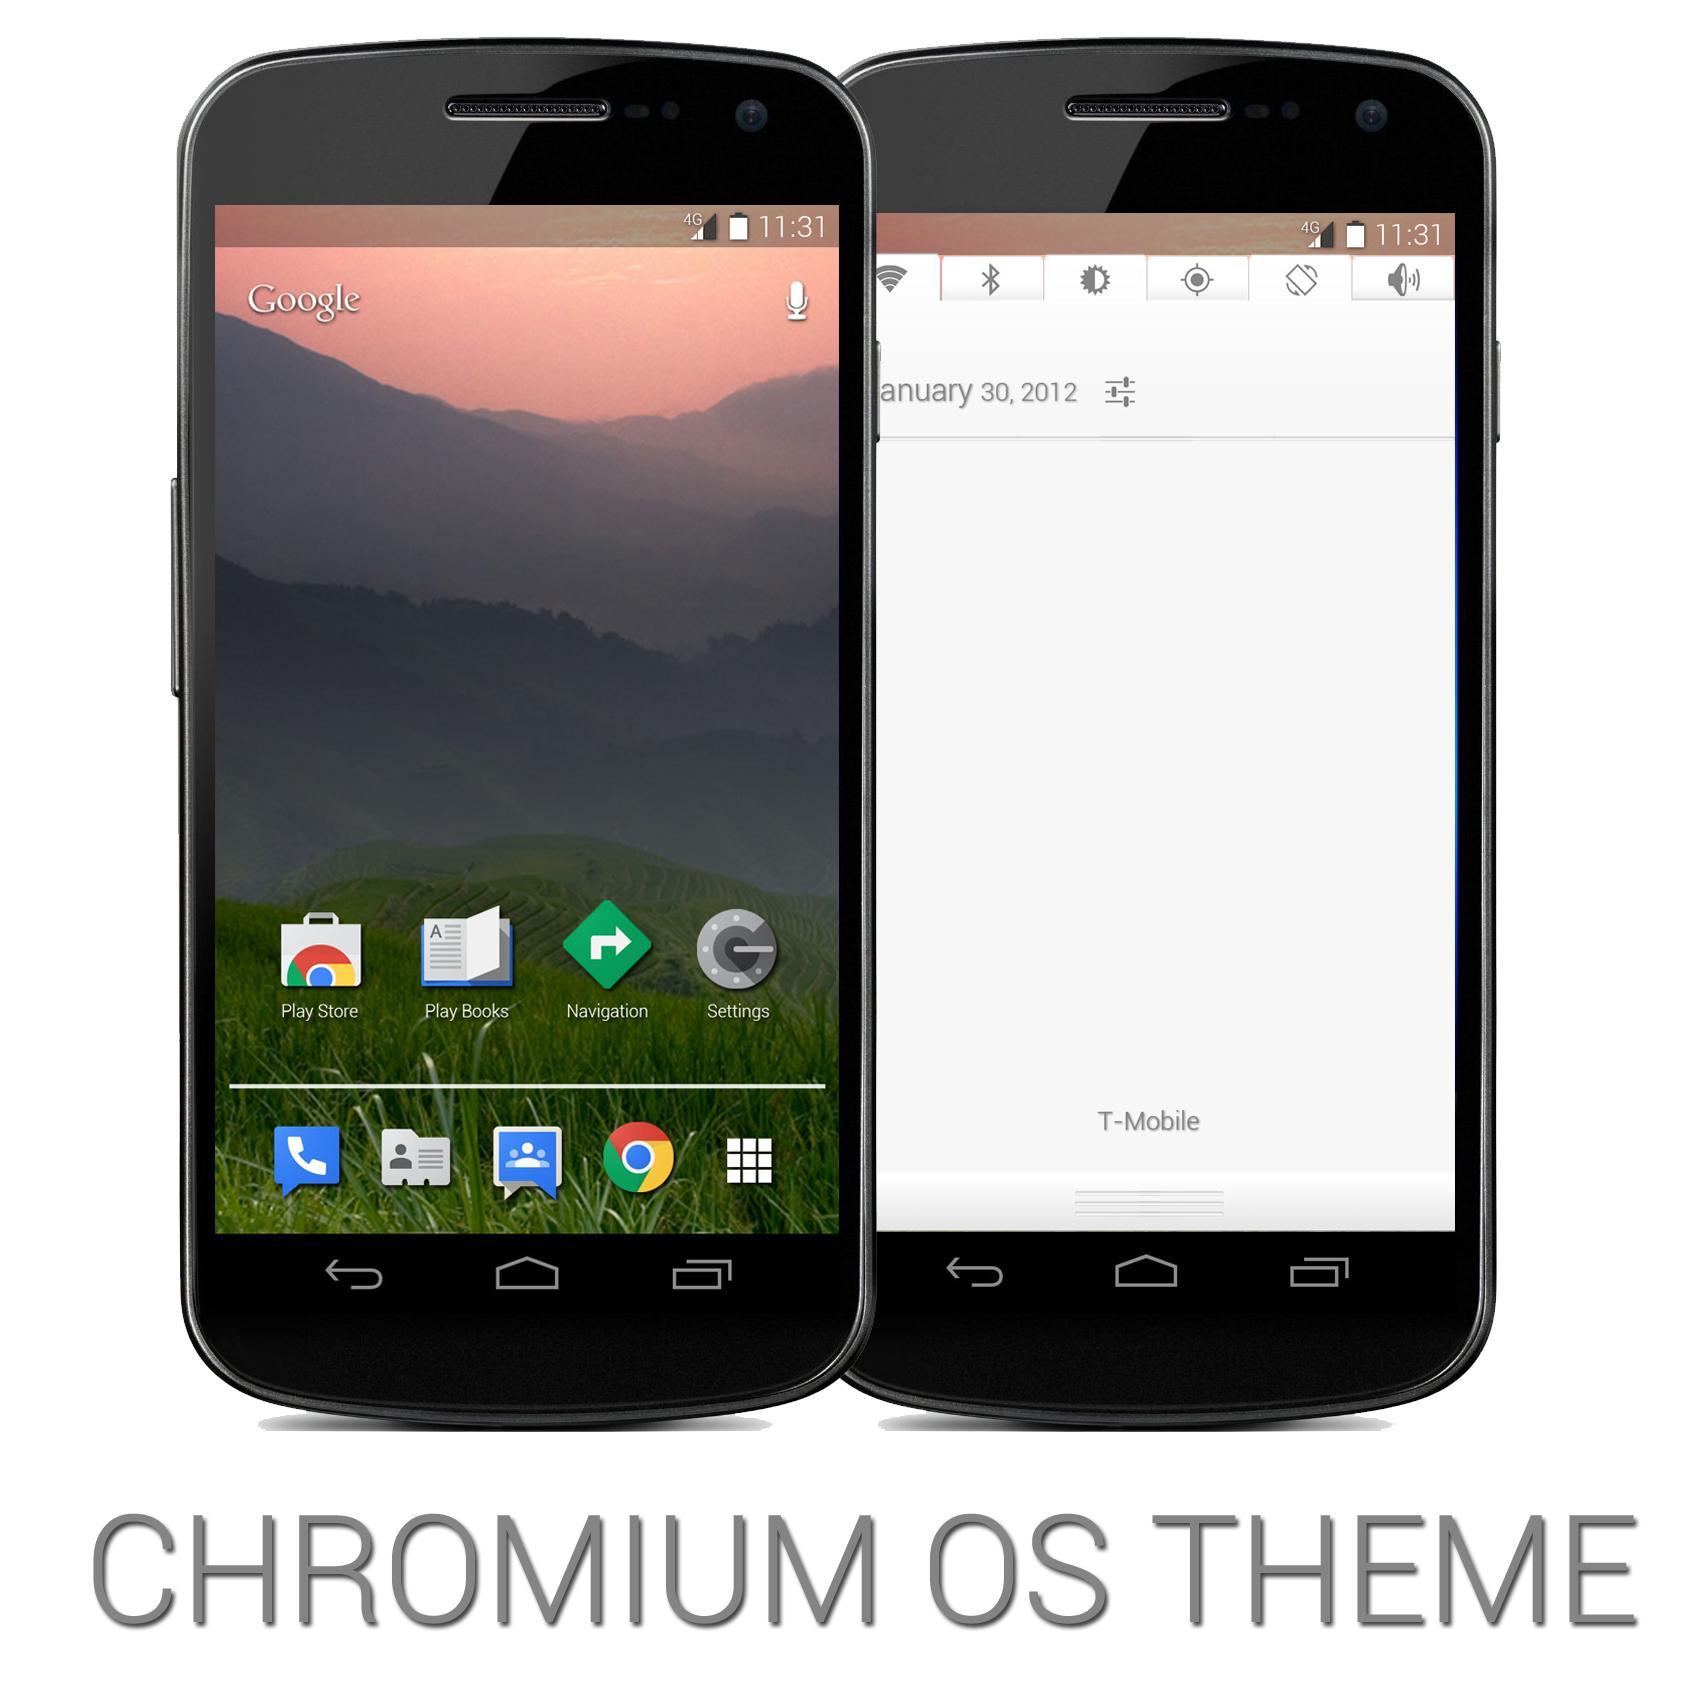 Google android theme for chrome - Phone Chrome Os On Android Phone Chrome Os Android Theme